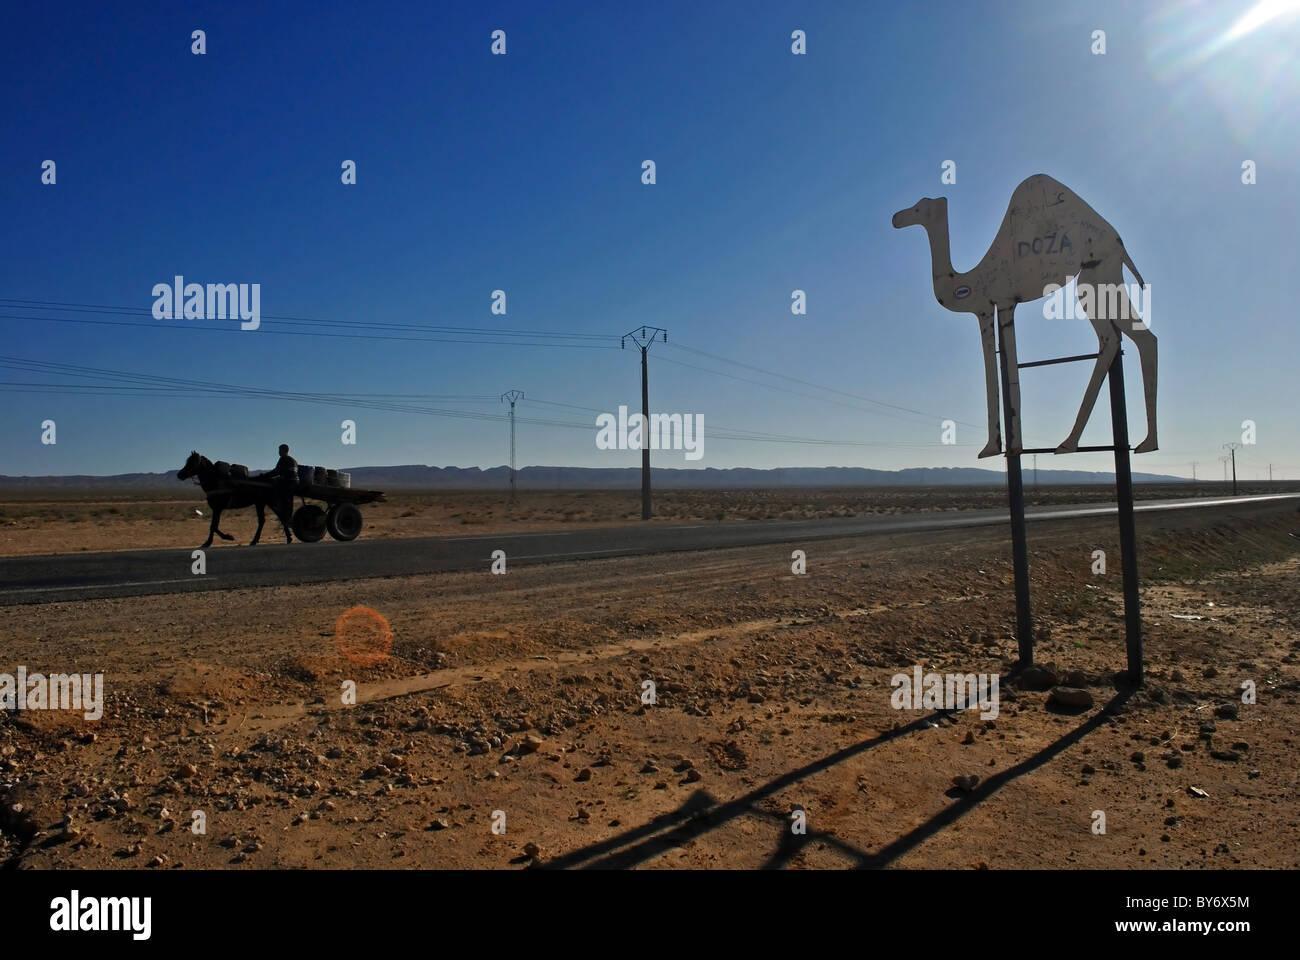 Desert road and camel sign near Douz, Tunisia Stock Photo